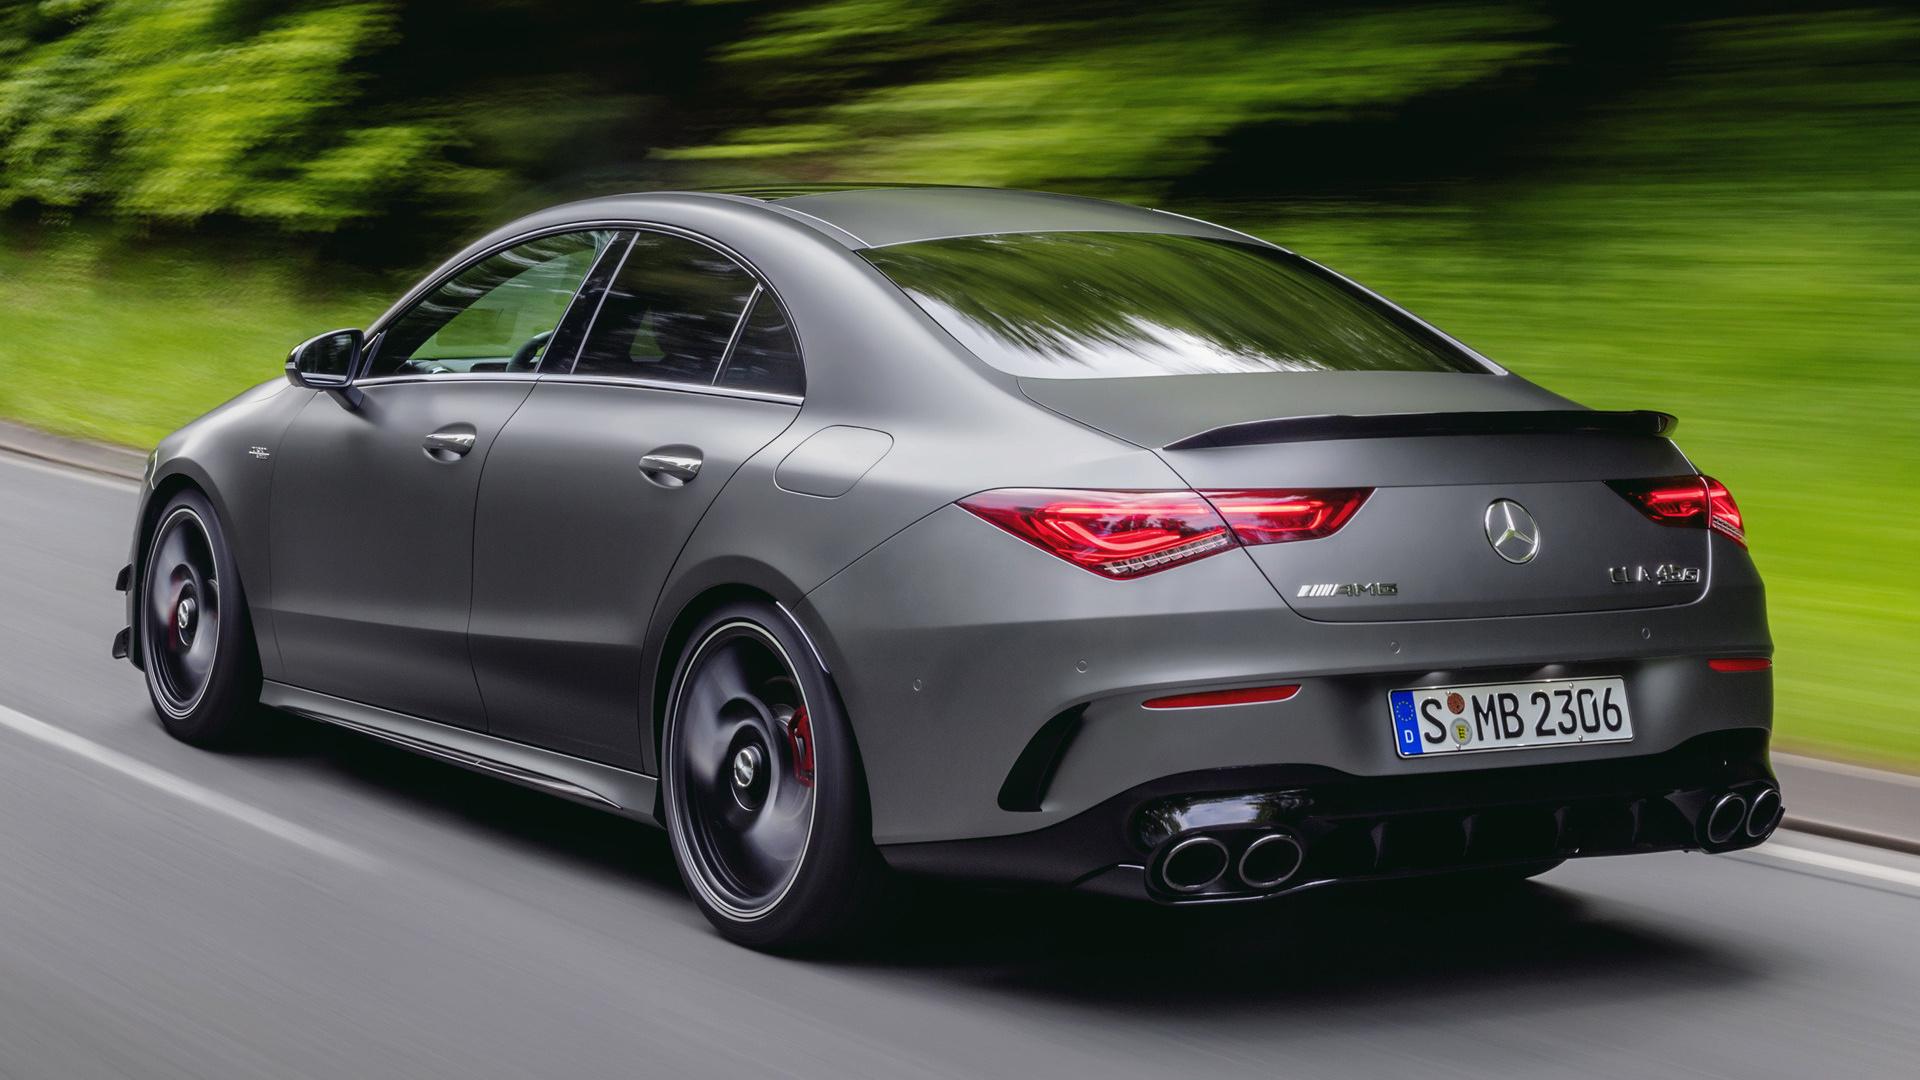 2019 Mercedes-AMG CLA 45 S Aerodynamics Package ...